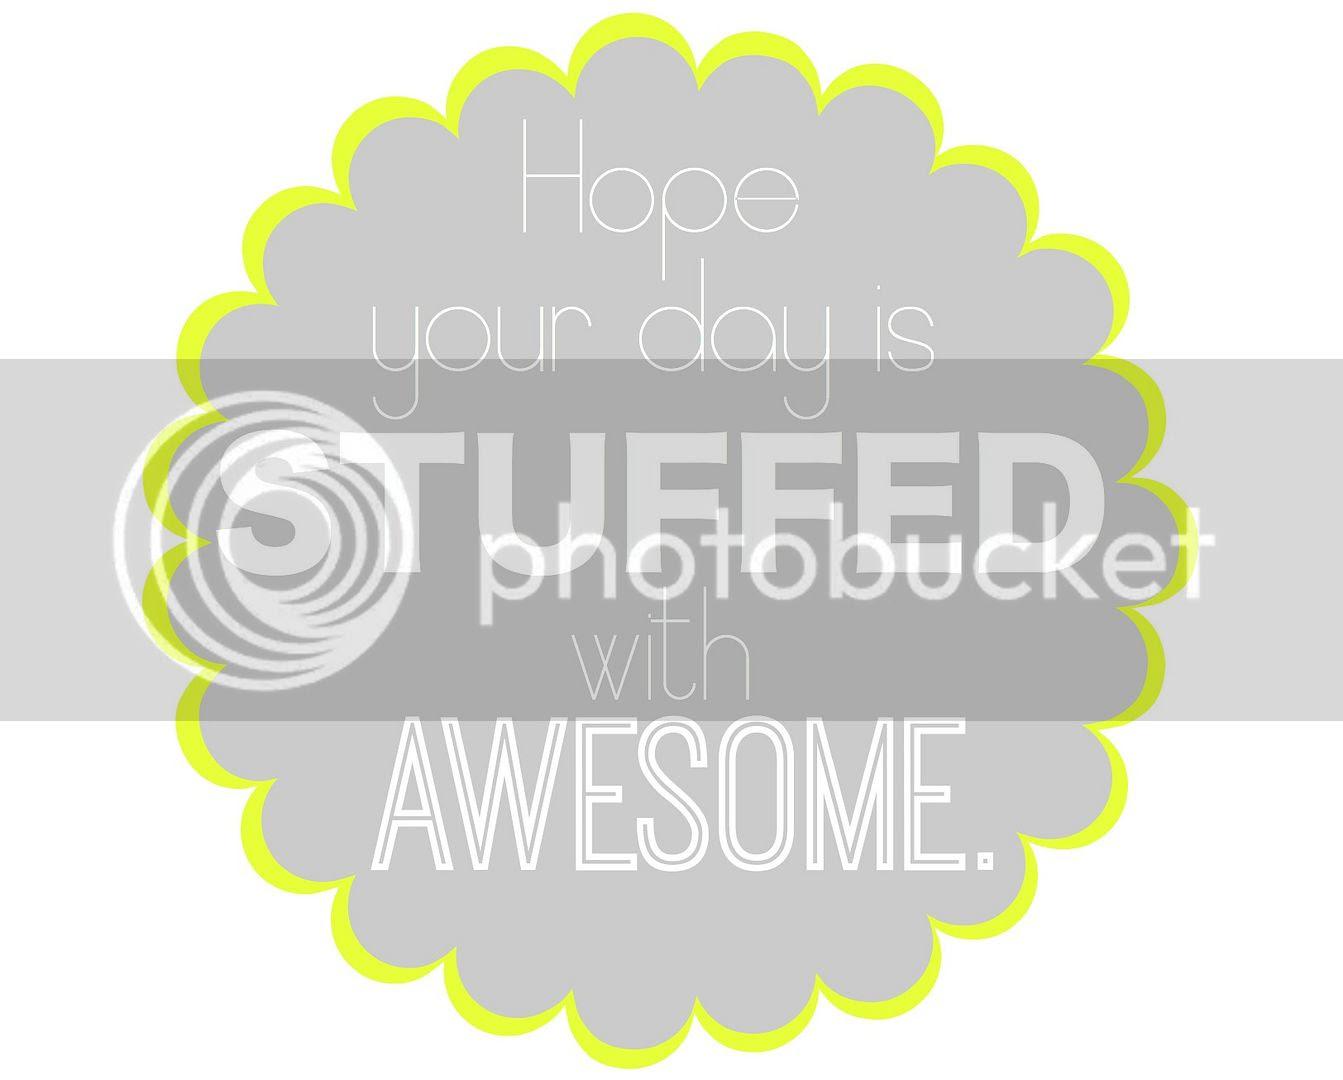 stuffed gift tag photo printabletag2_zpse2fc902e.jpg